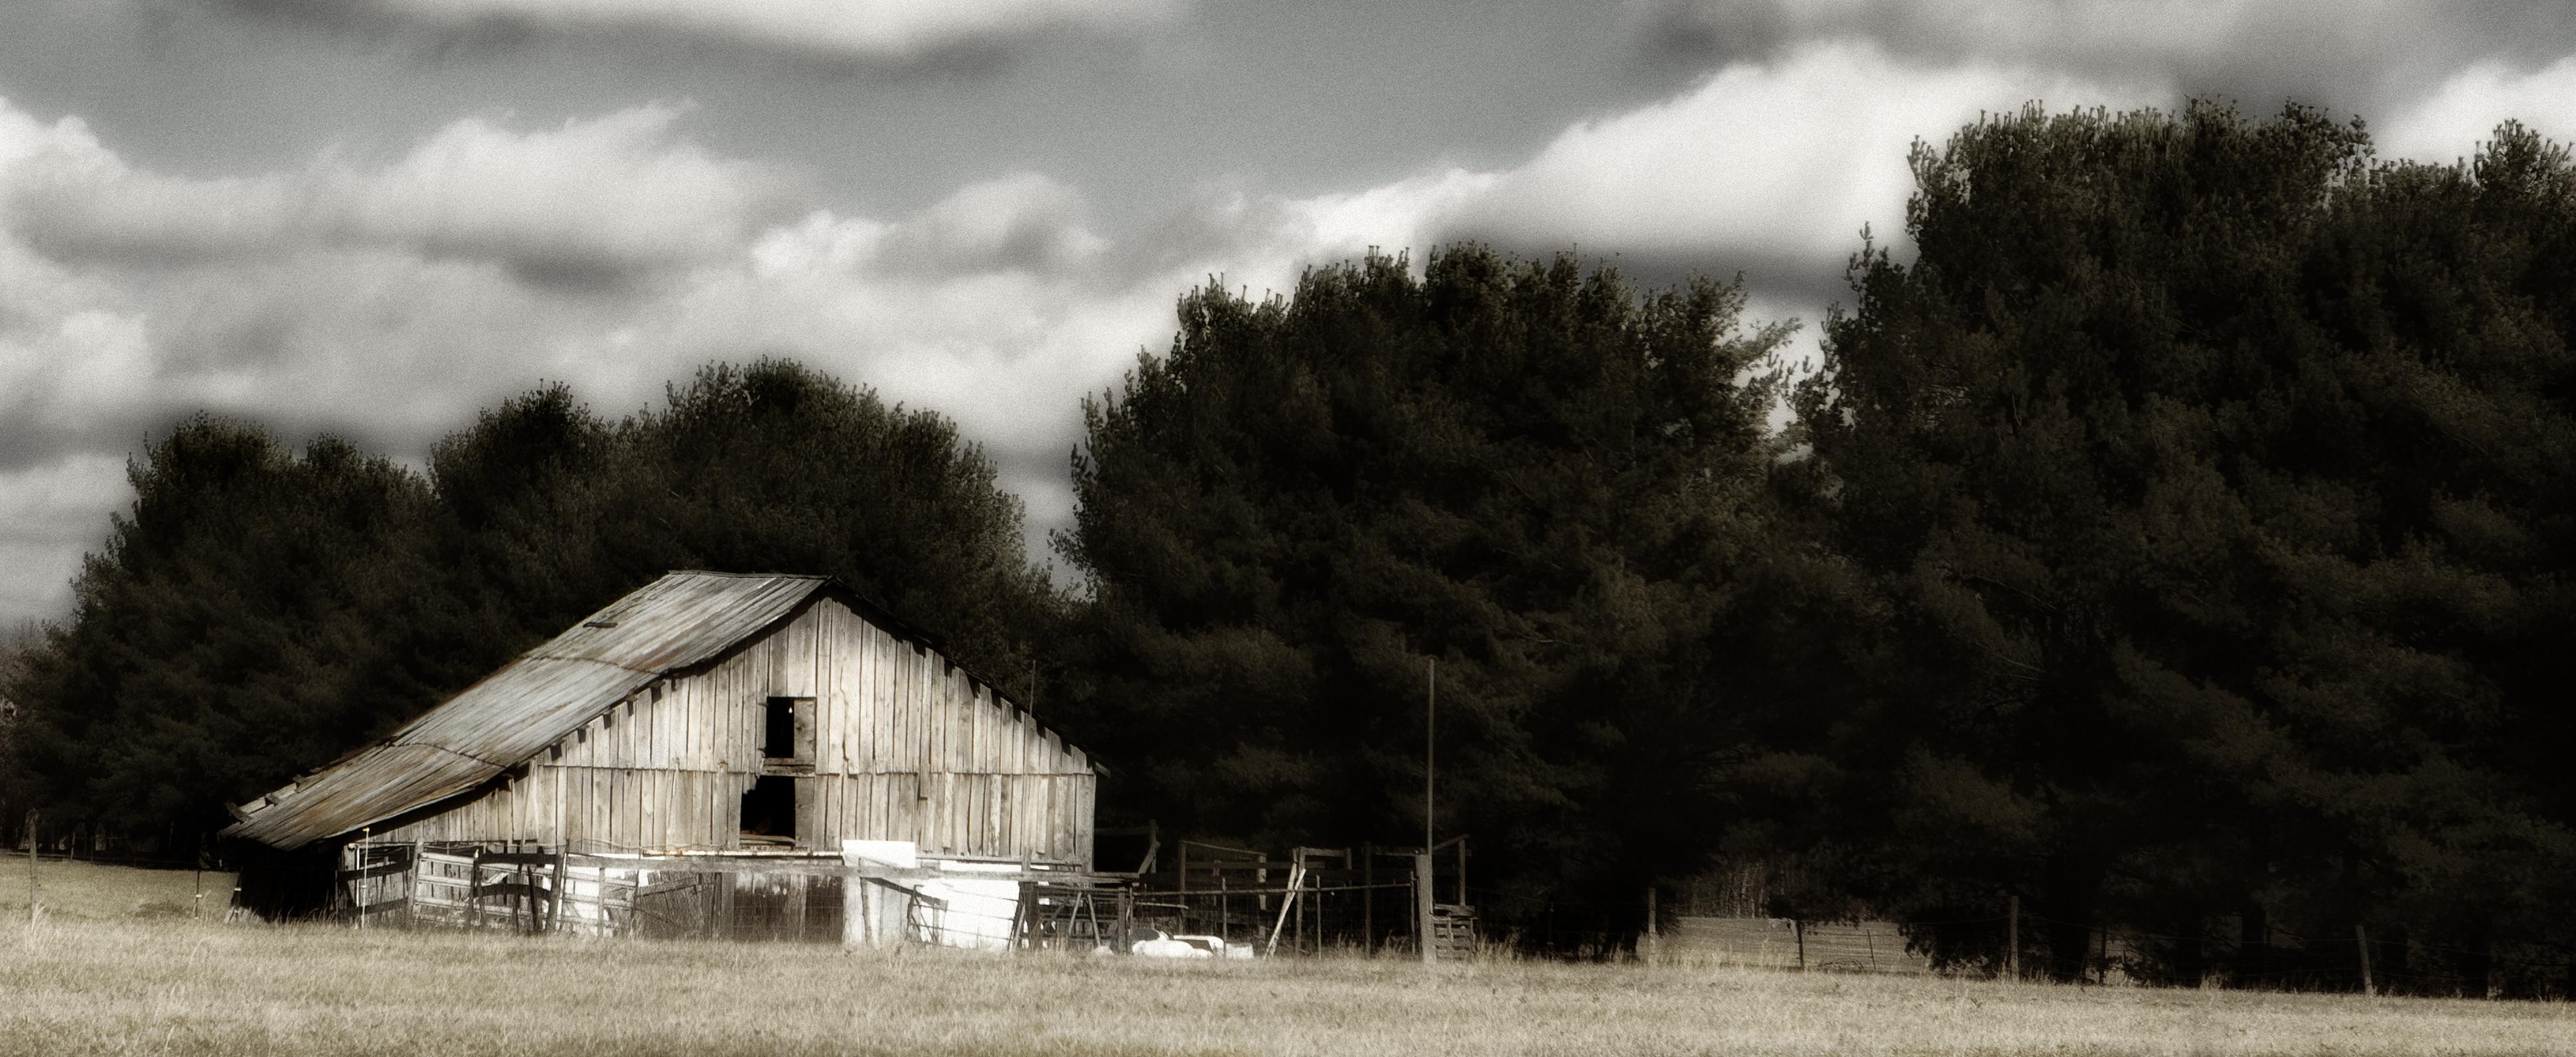 Bobby's Barn